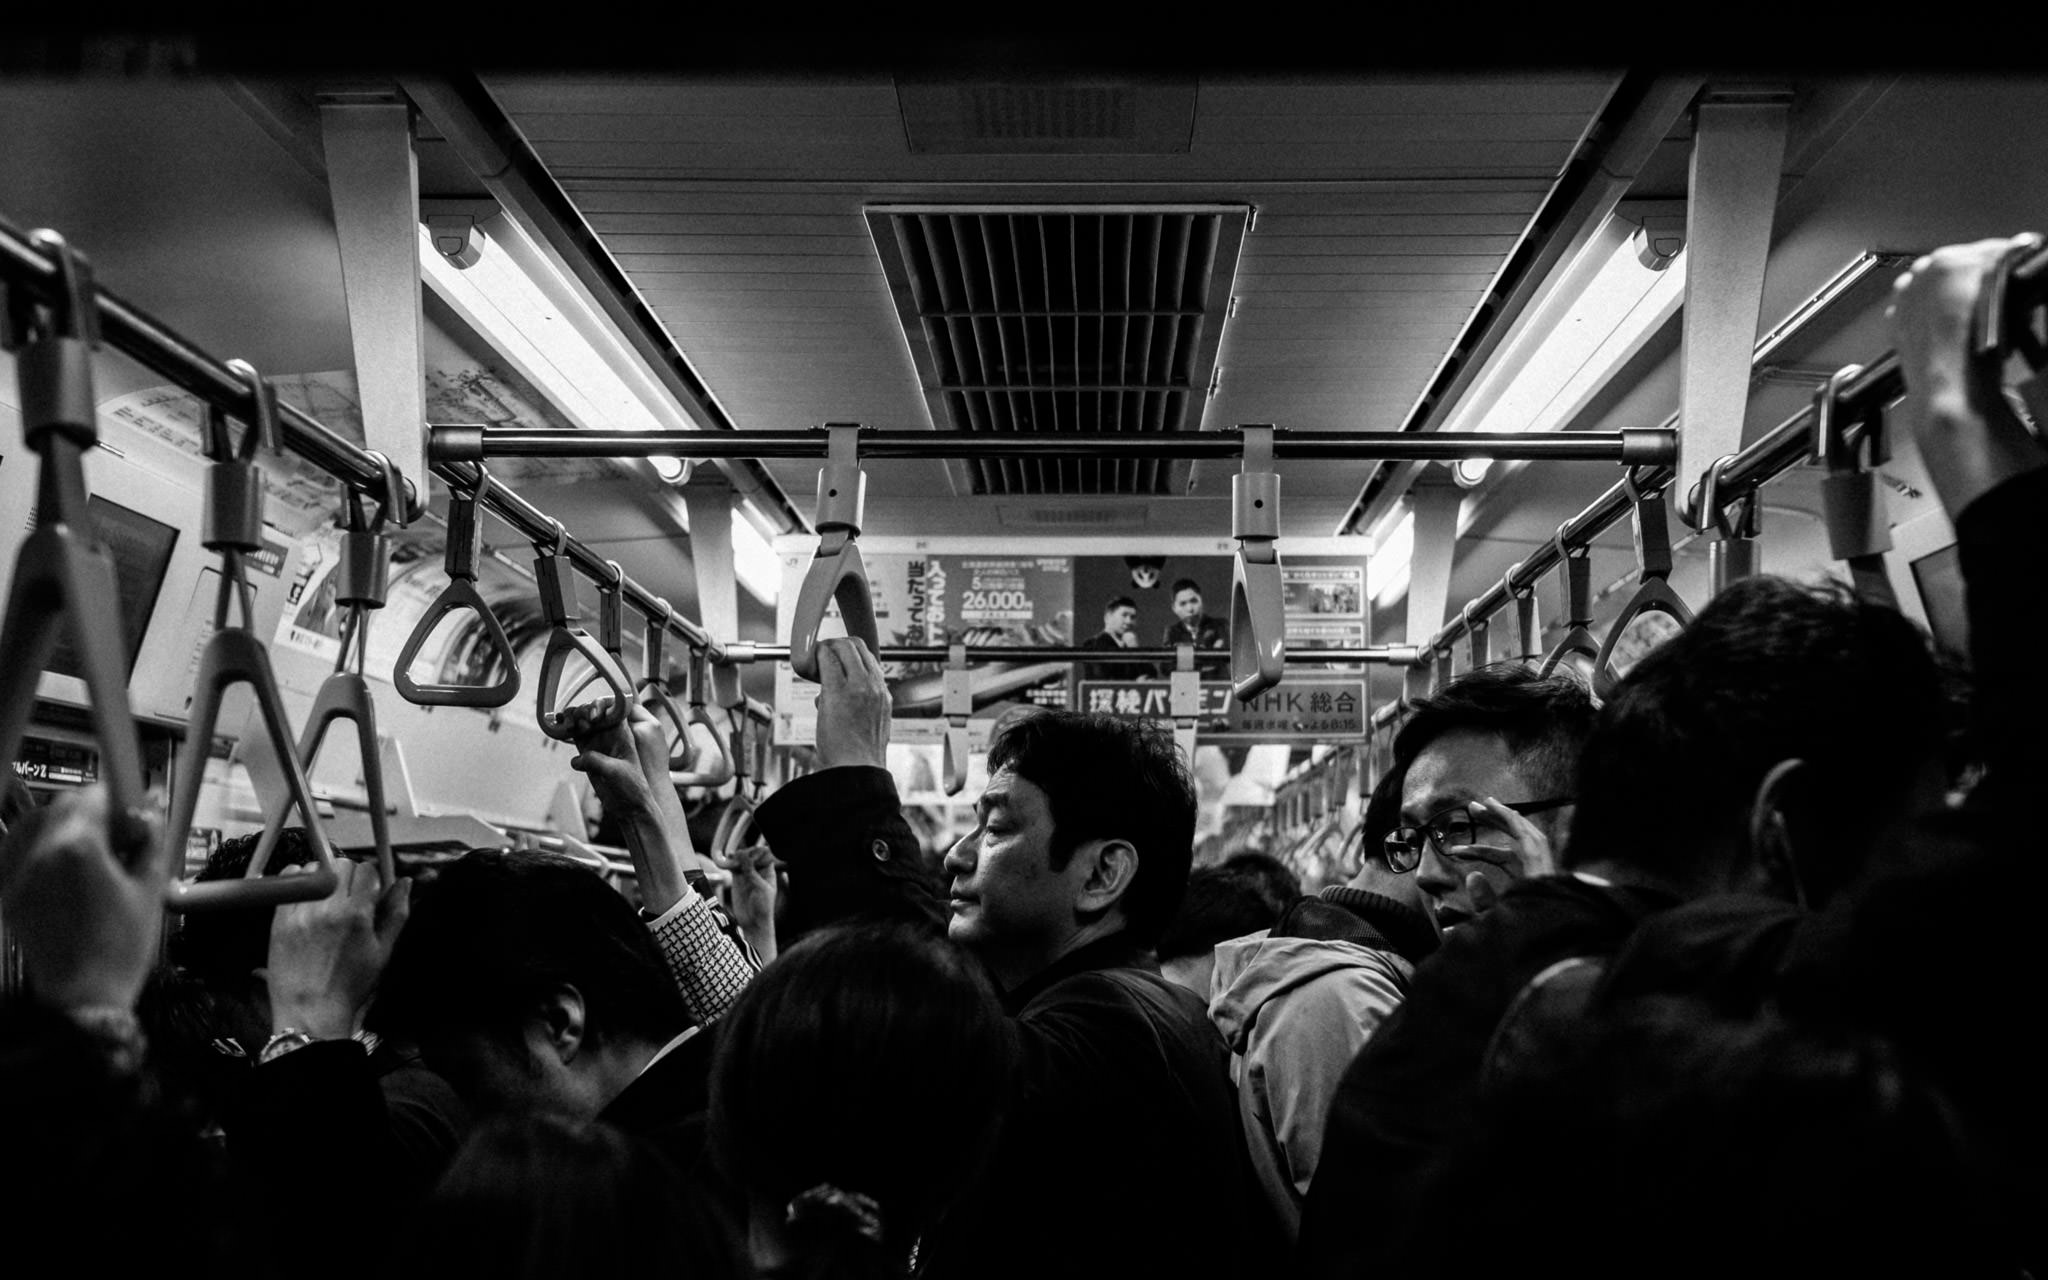 chris_eberhardt_japan_travel_reise_nippon-31.jpg